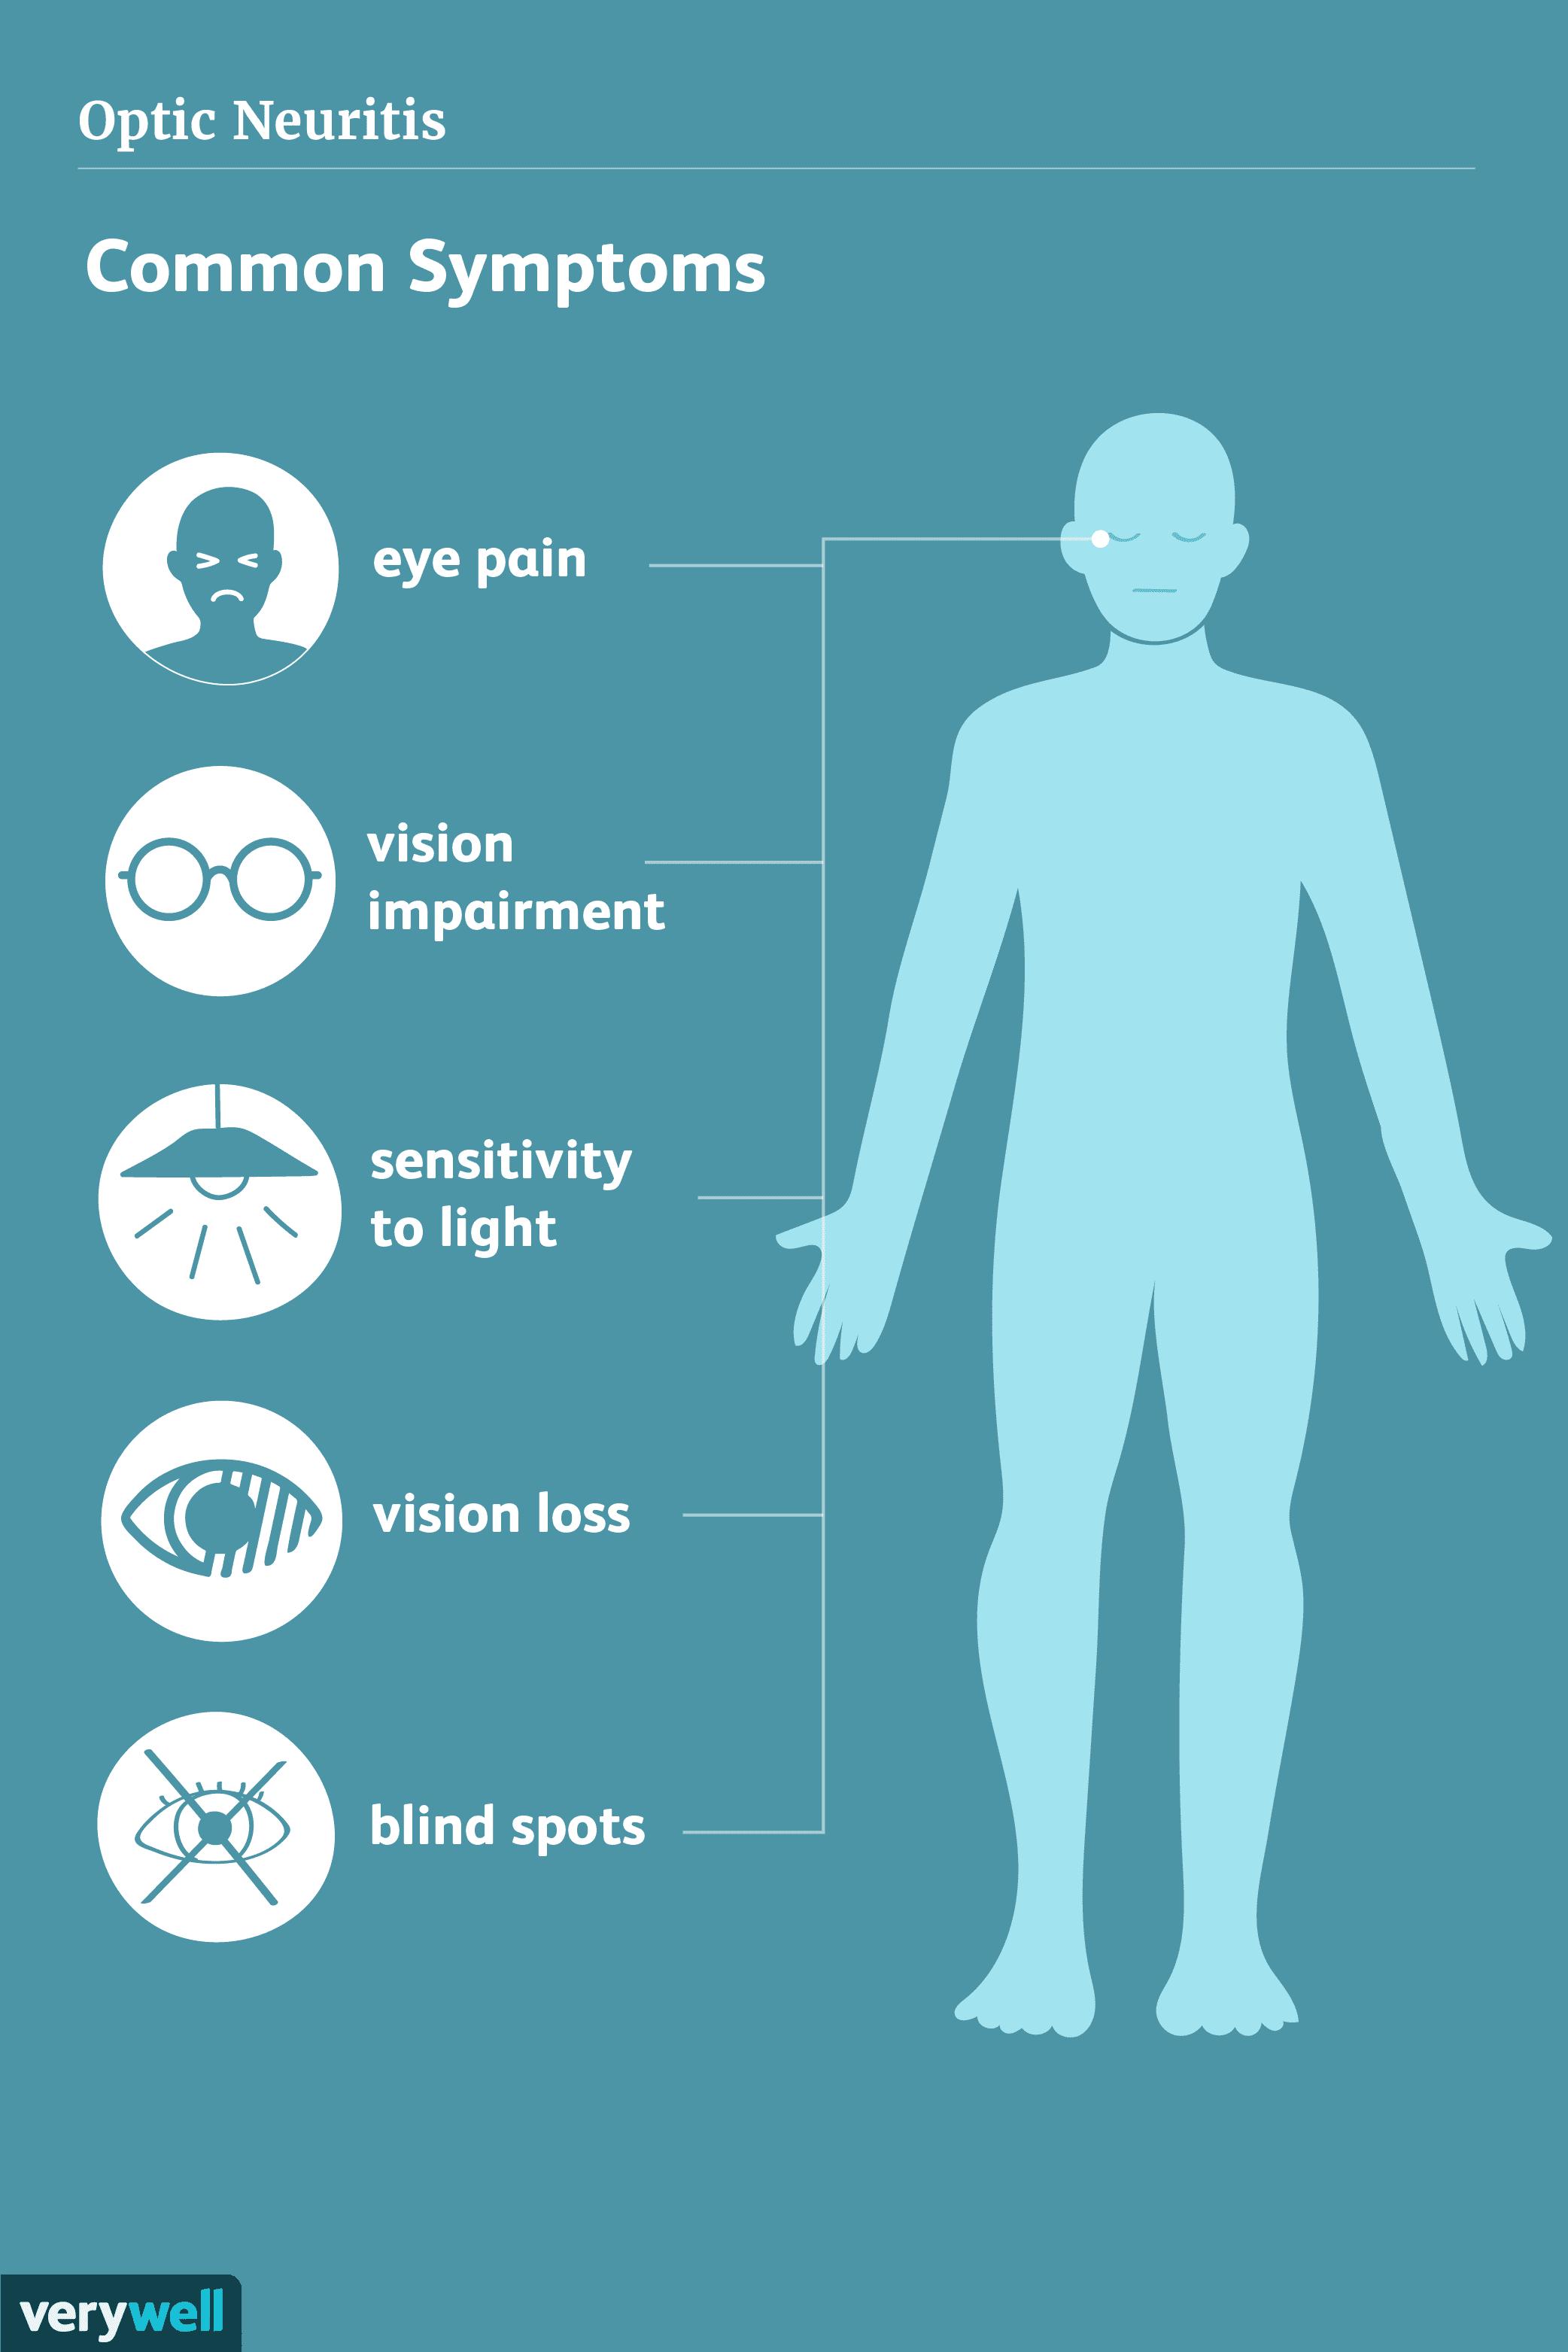 Optic Neuritis Symptoms